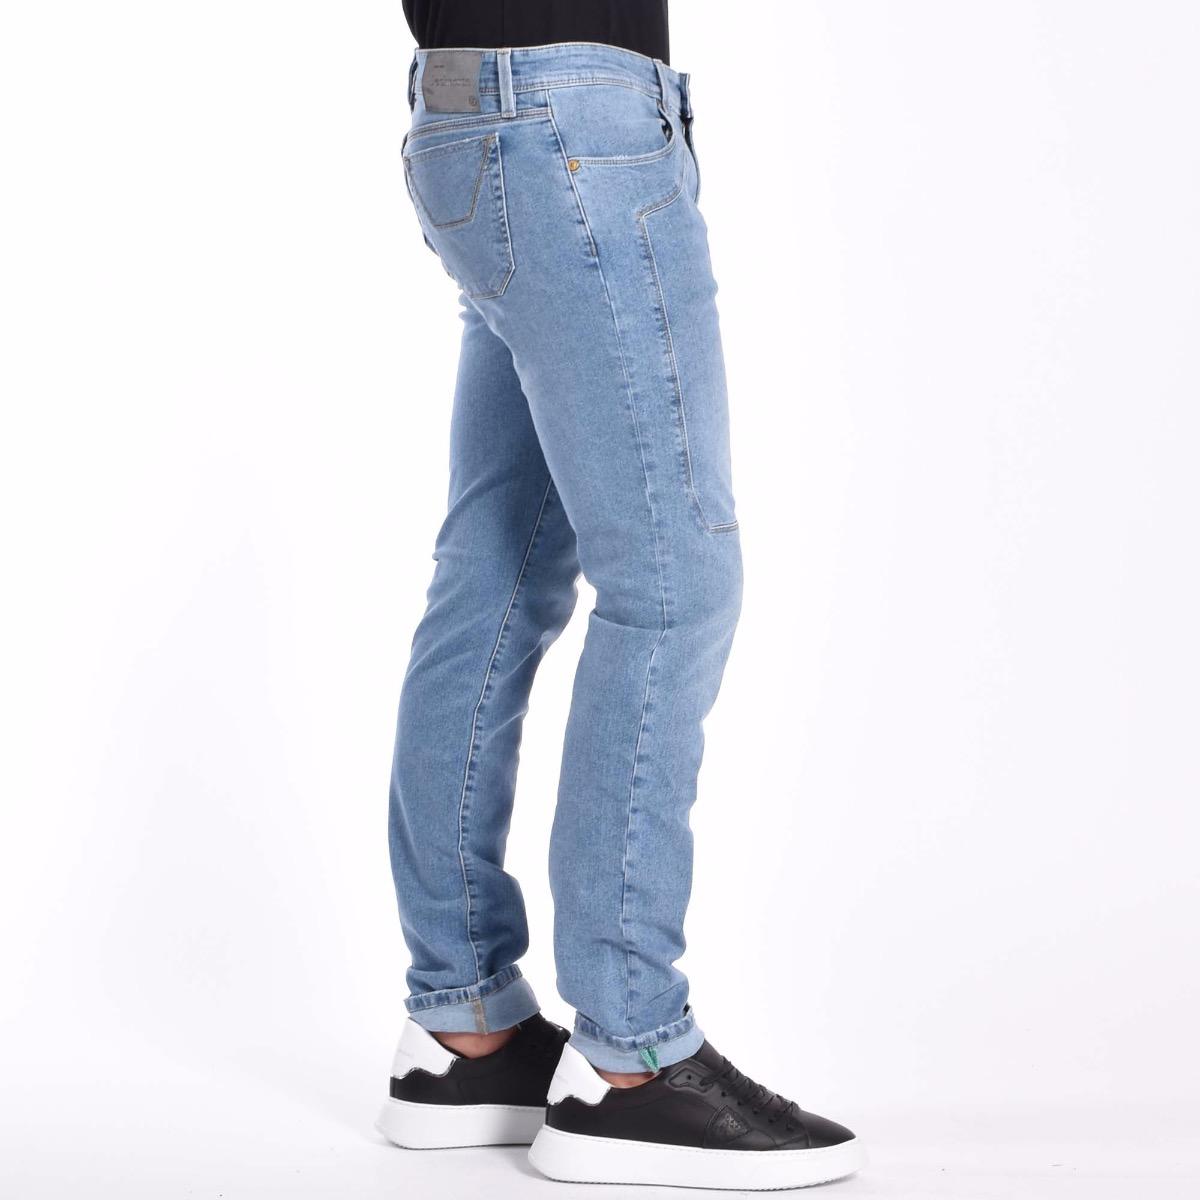 Jeans toppa - Denim